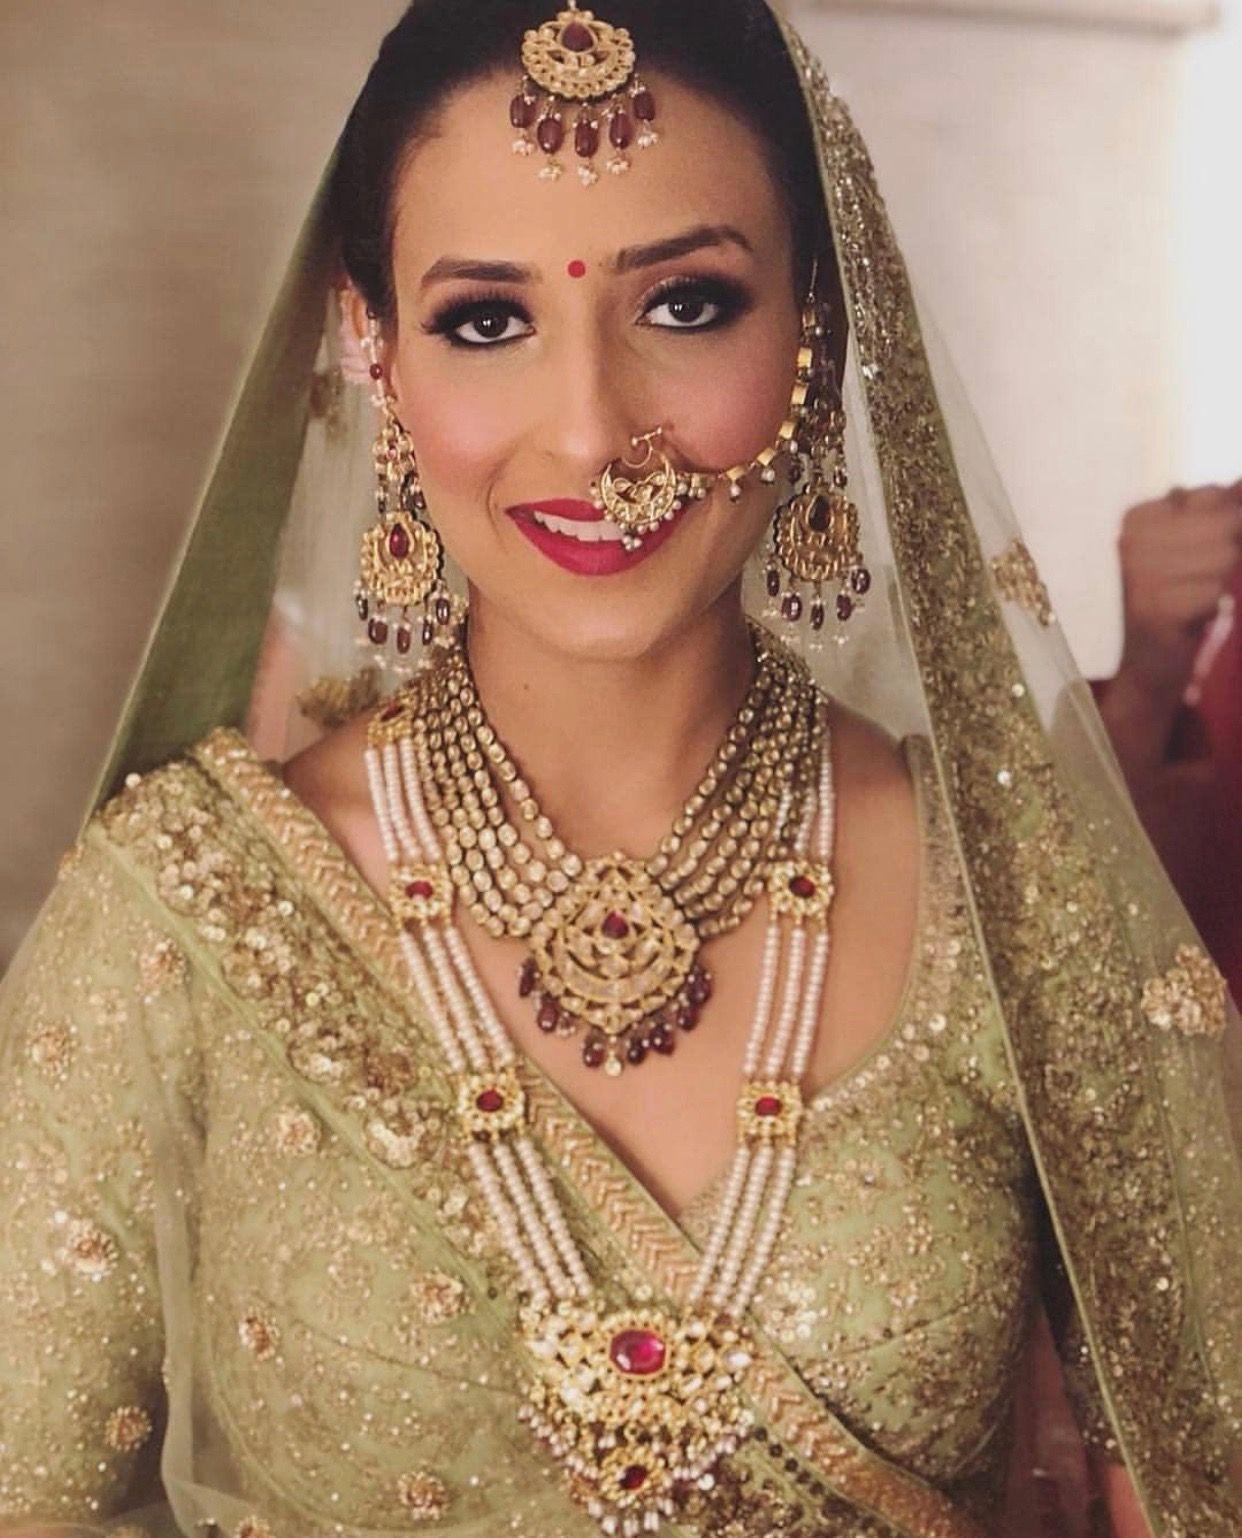 Pin by Bhumika Dubey on Wedding Bridal Inspiration   Indian bride, Bridal  designs, Bridal